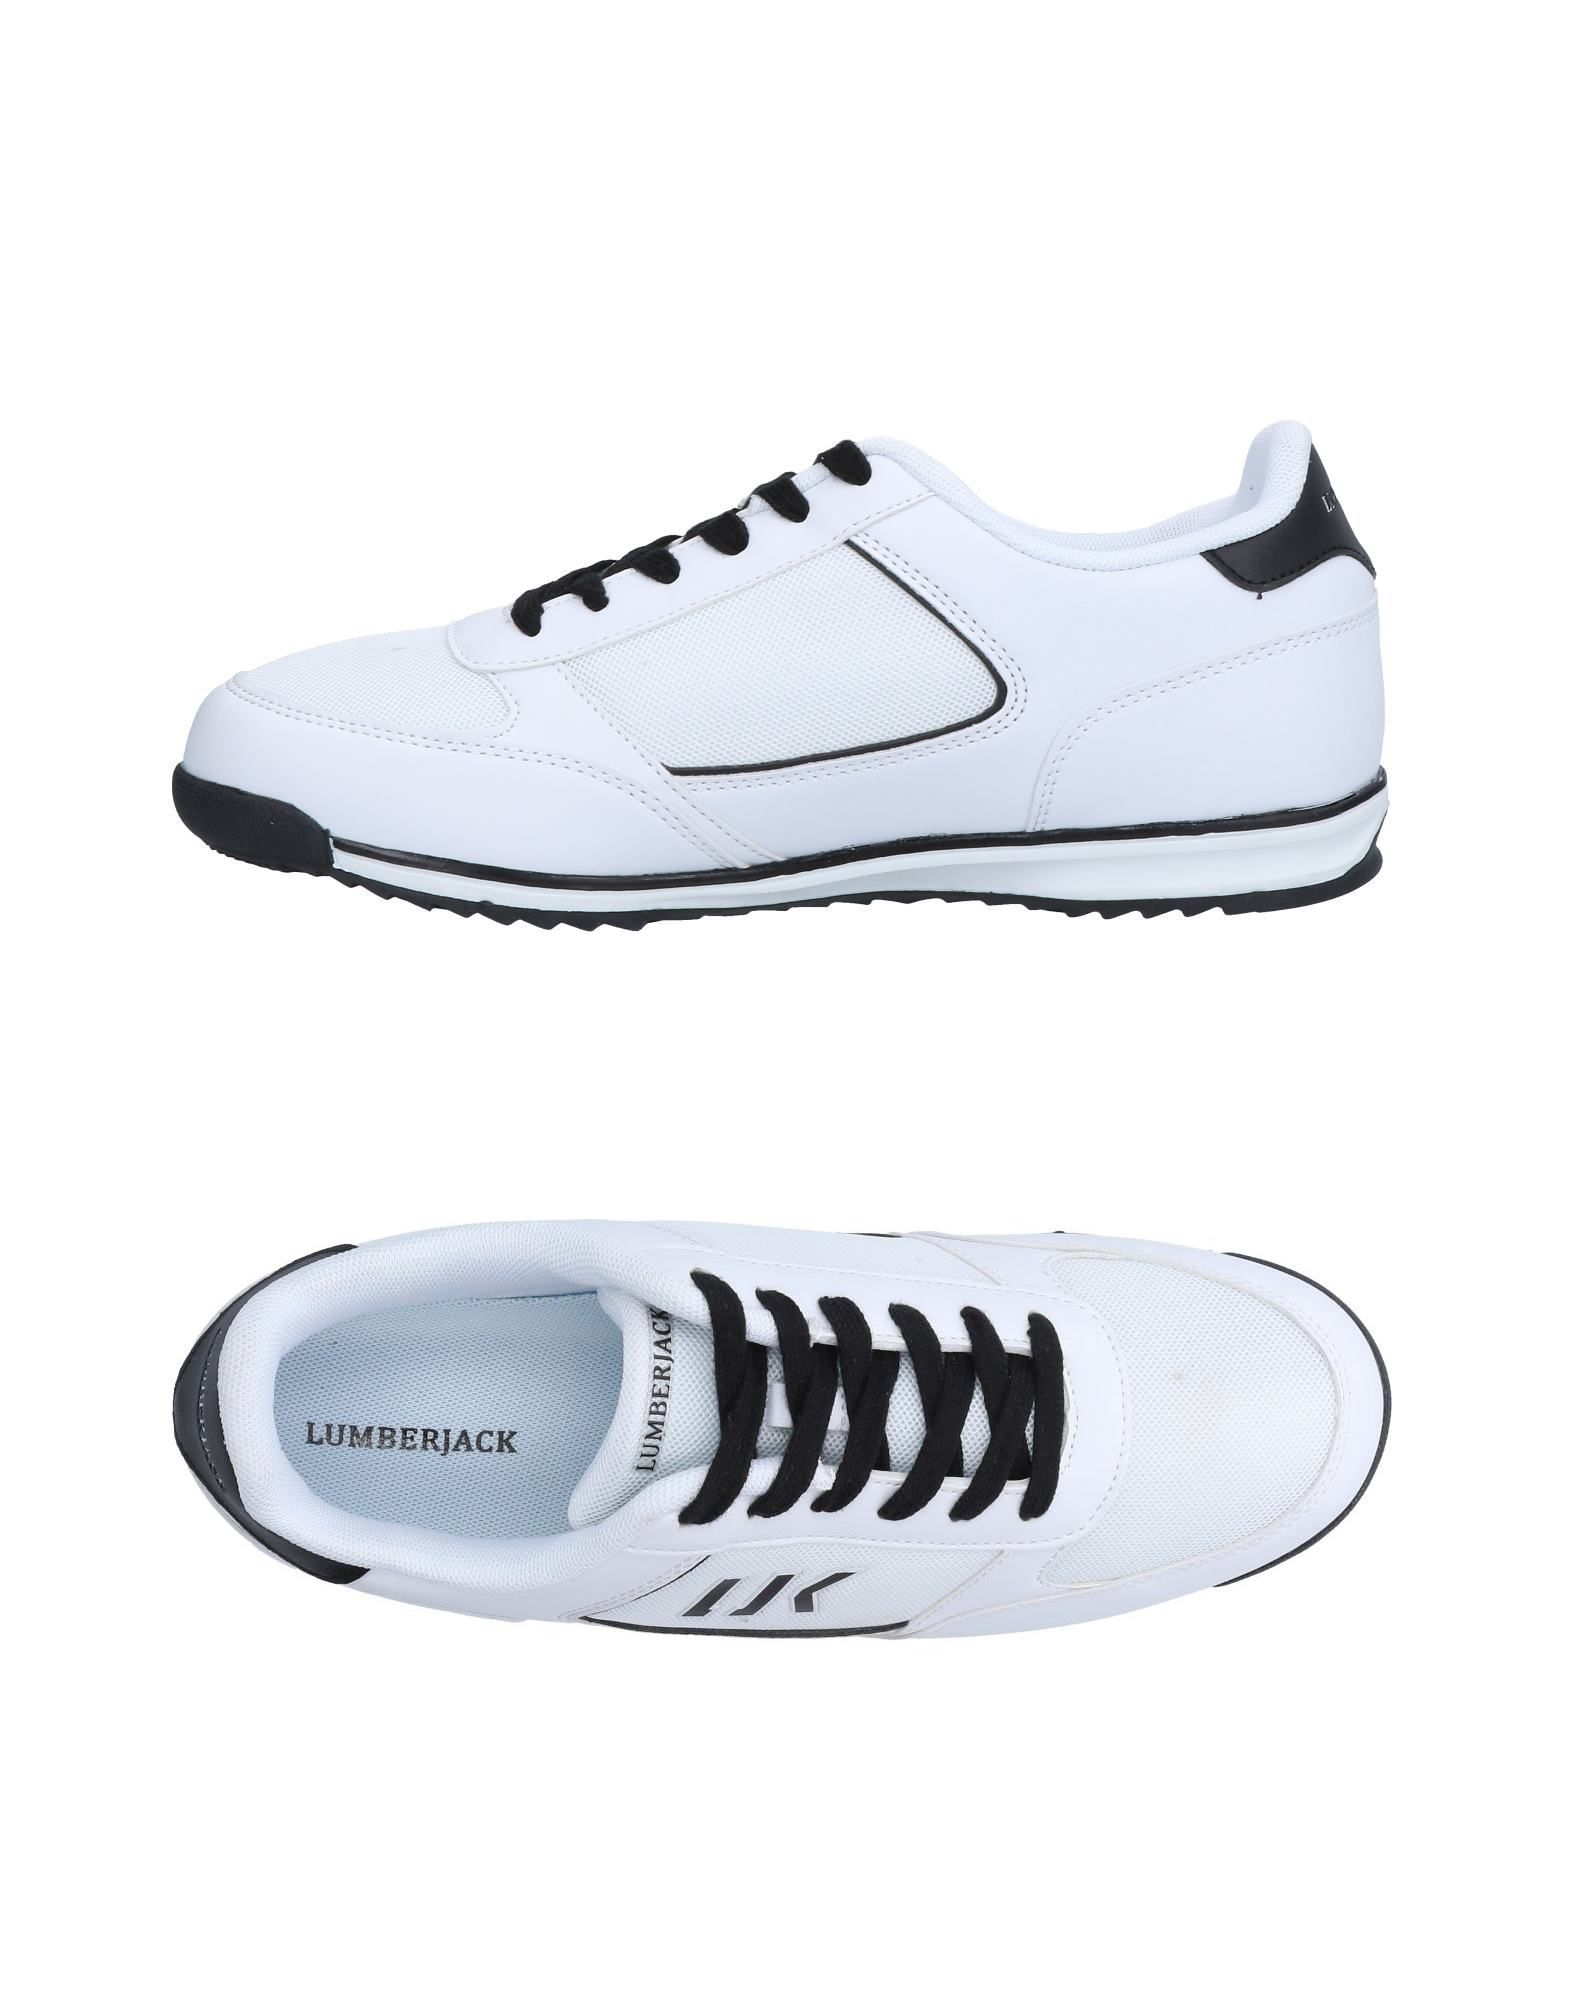 Moda Sneakers Sneakers Moda Lumberjack Uomo - 11515477GR d3f60f